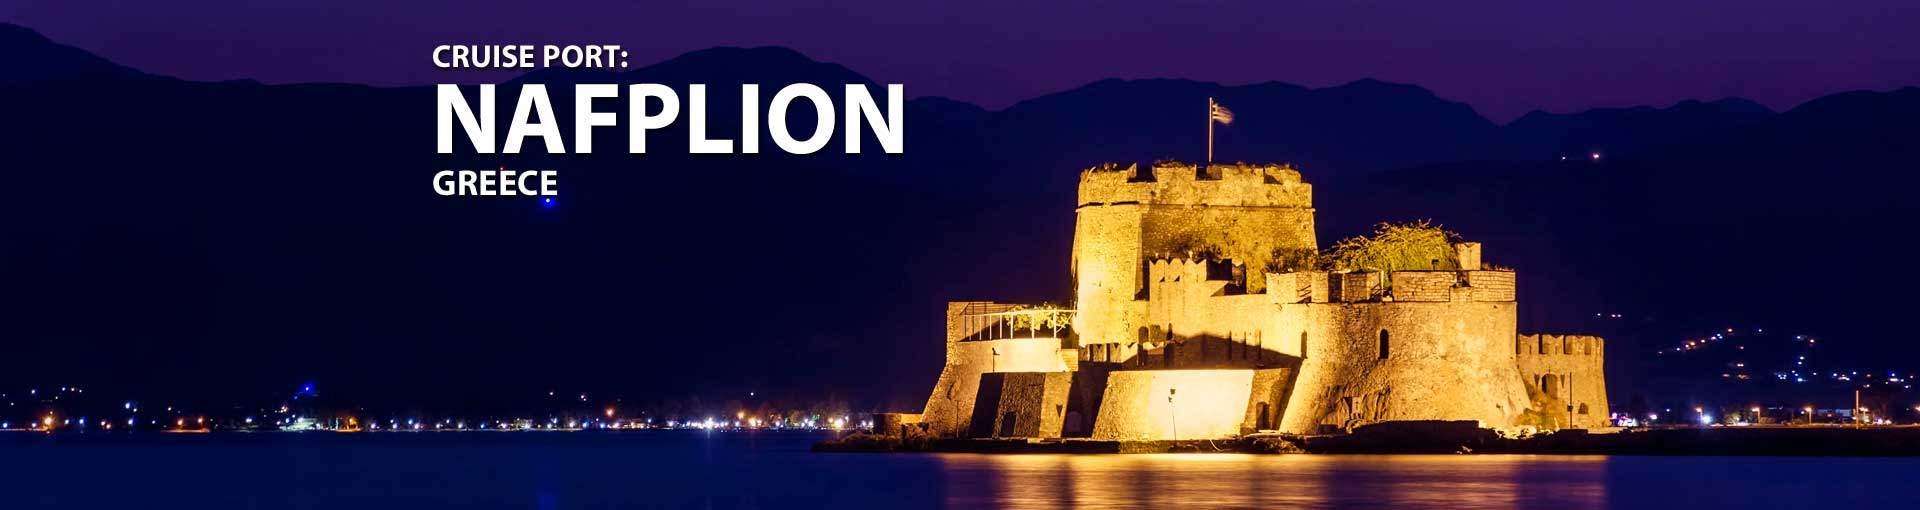 Cruises to Nafplion, Greece